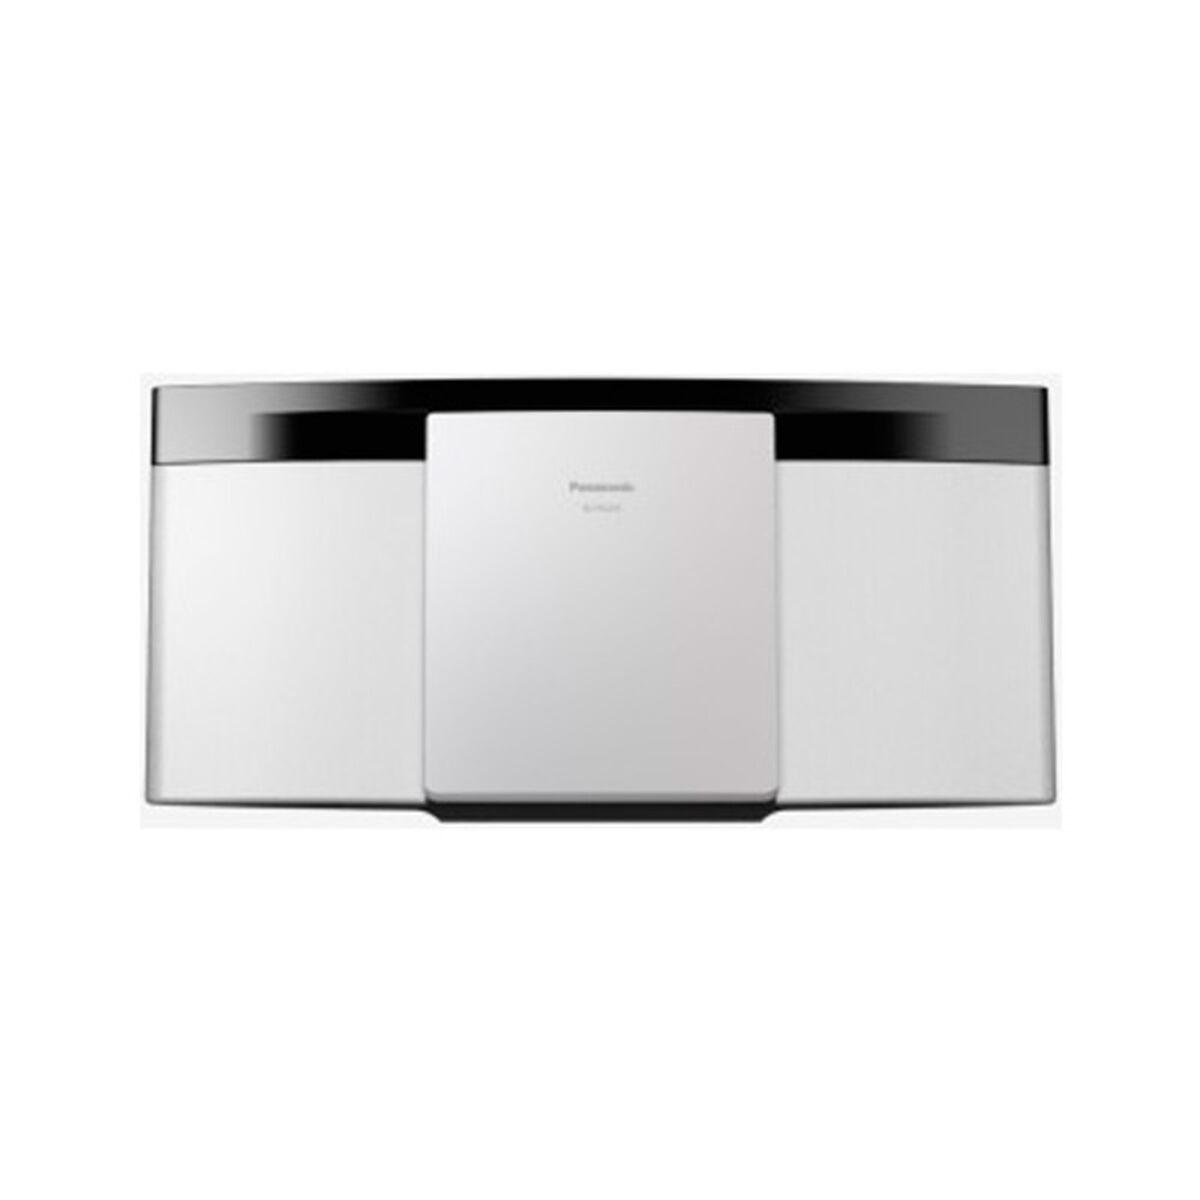 Mini Hifi Panasonic Corp. SCHC200EGW HiFi Bluetooth 20W White